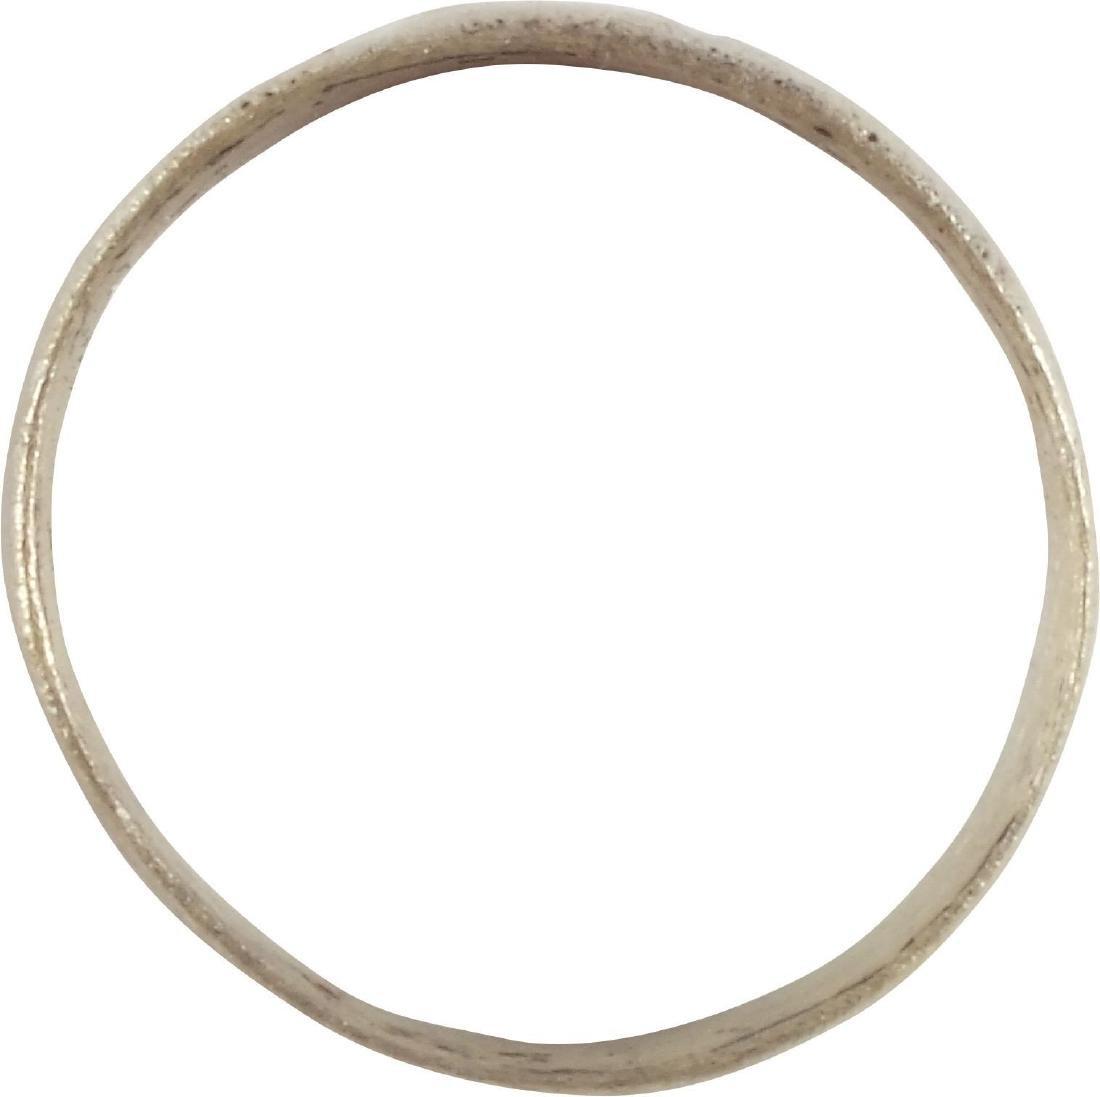 ANCIENT VIKING RING C.900 AD - 2